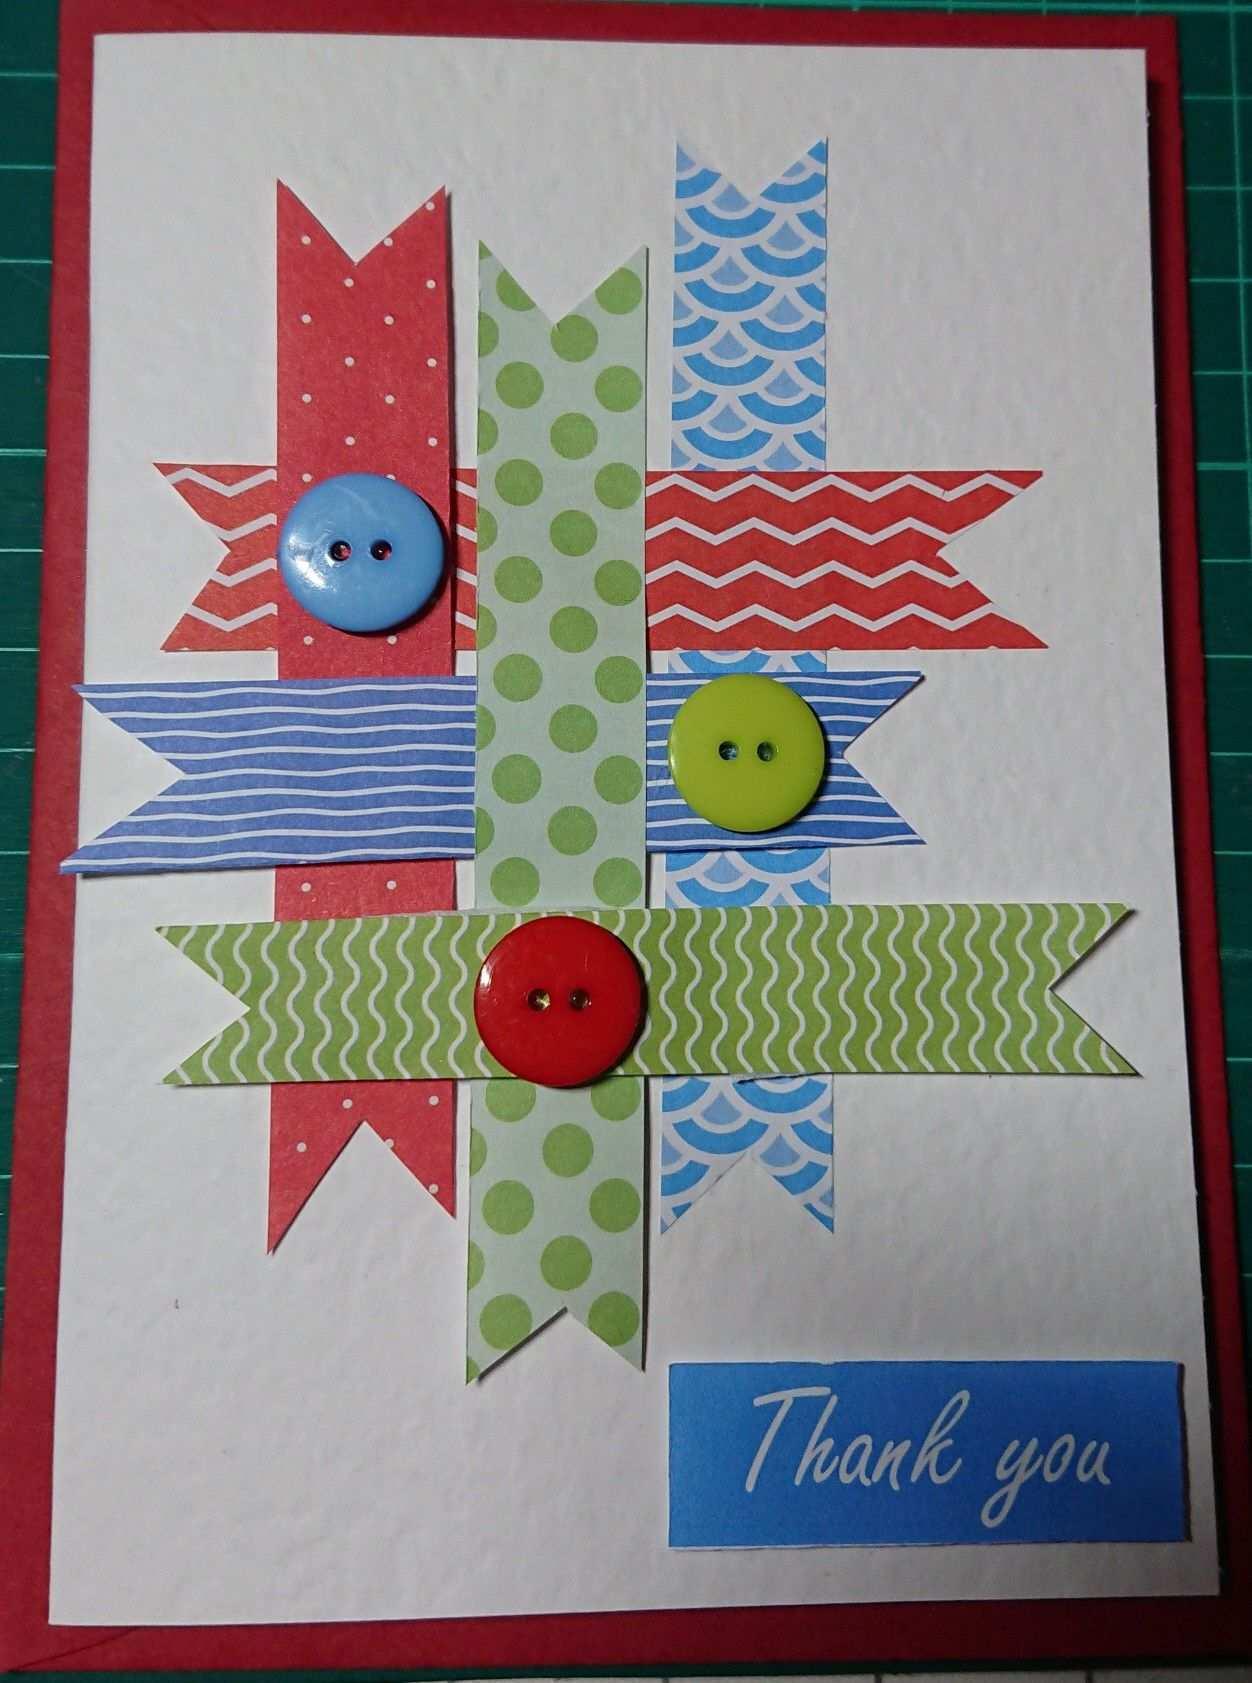 Pin By Marija Plastic On Kortinspiration Cards Handmade Card Craft Simple Cards